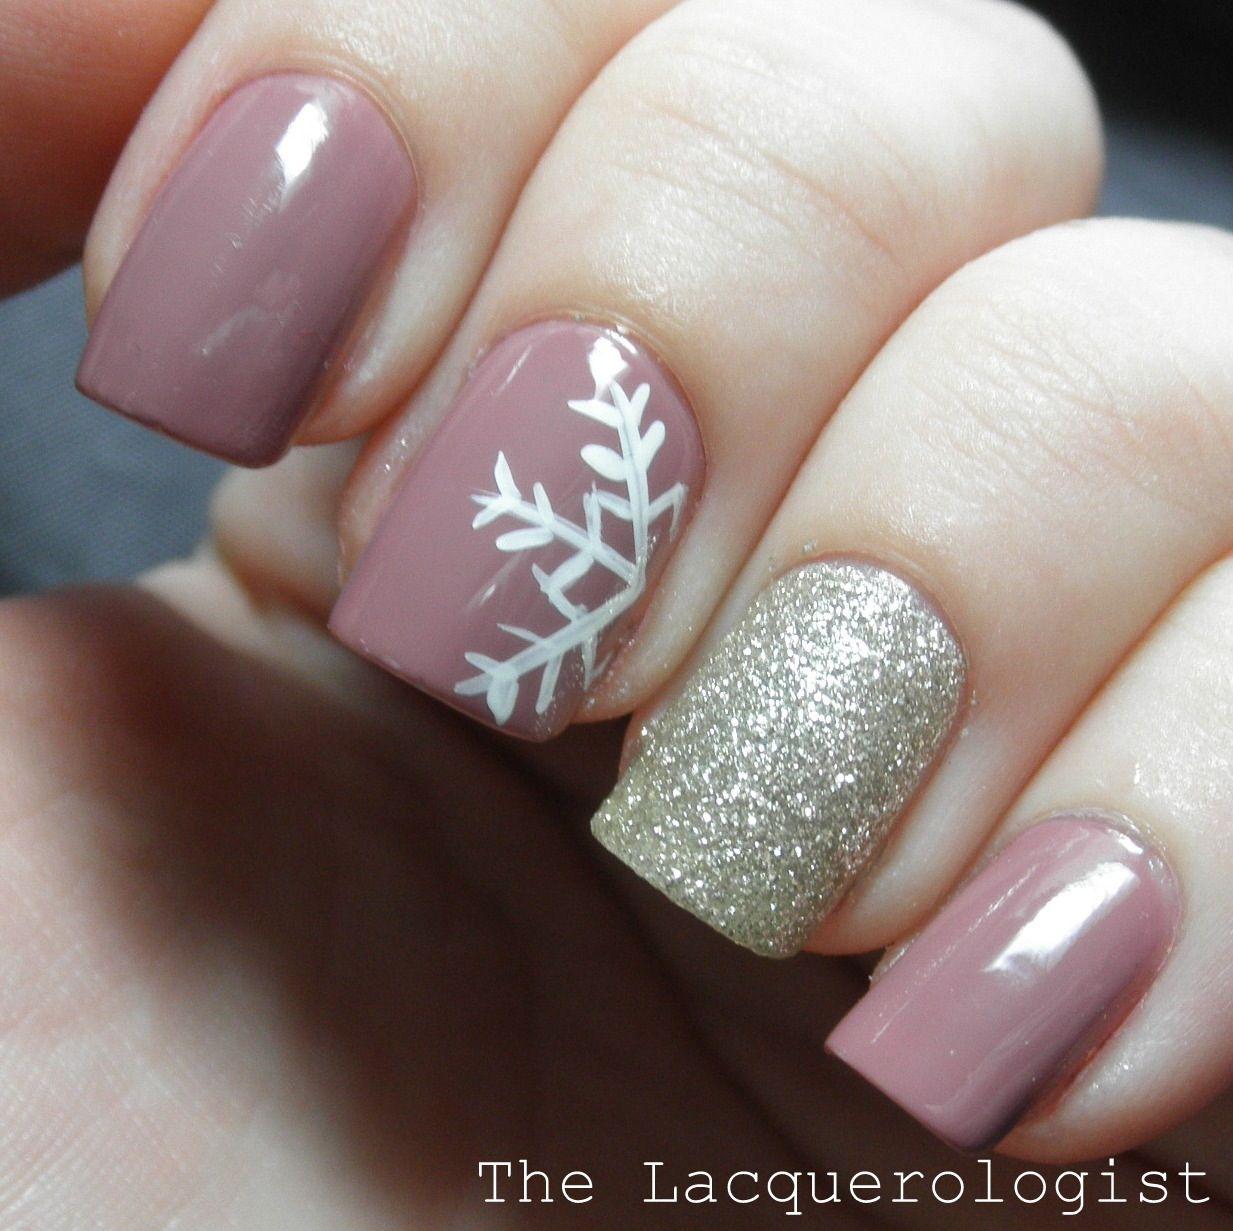 Winter Nail Art: Winter Nail Art Snowflake Glitter